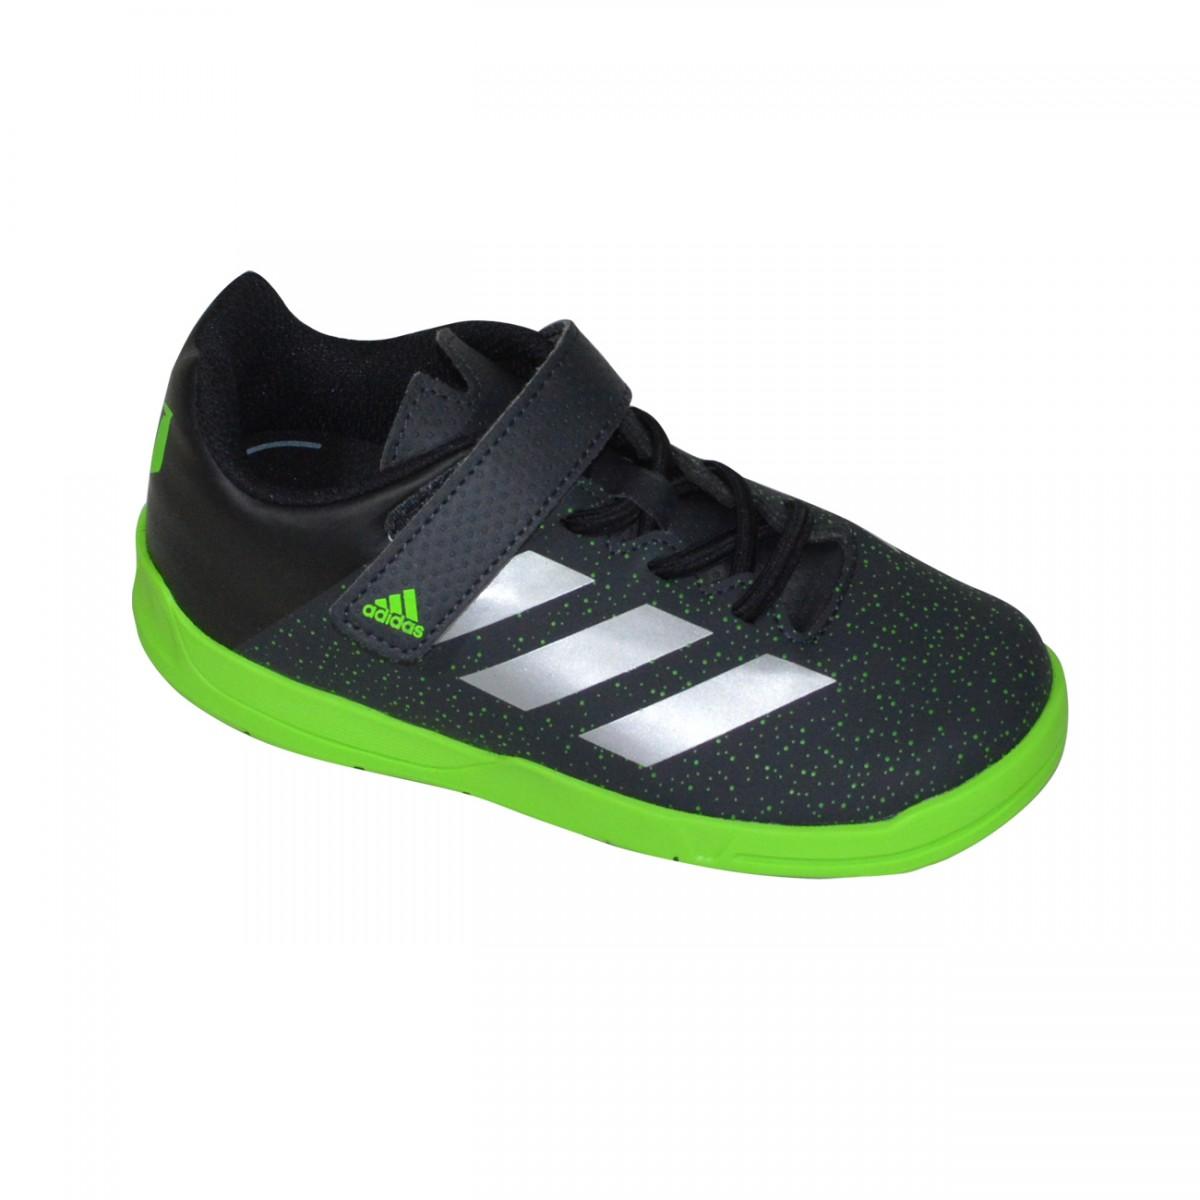 cf4e69e29d66f Tenis Adidas Messi EL AQ2802 - Preto Verde - Chuteira Nike